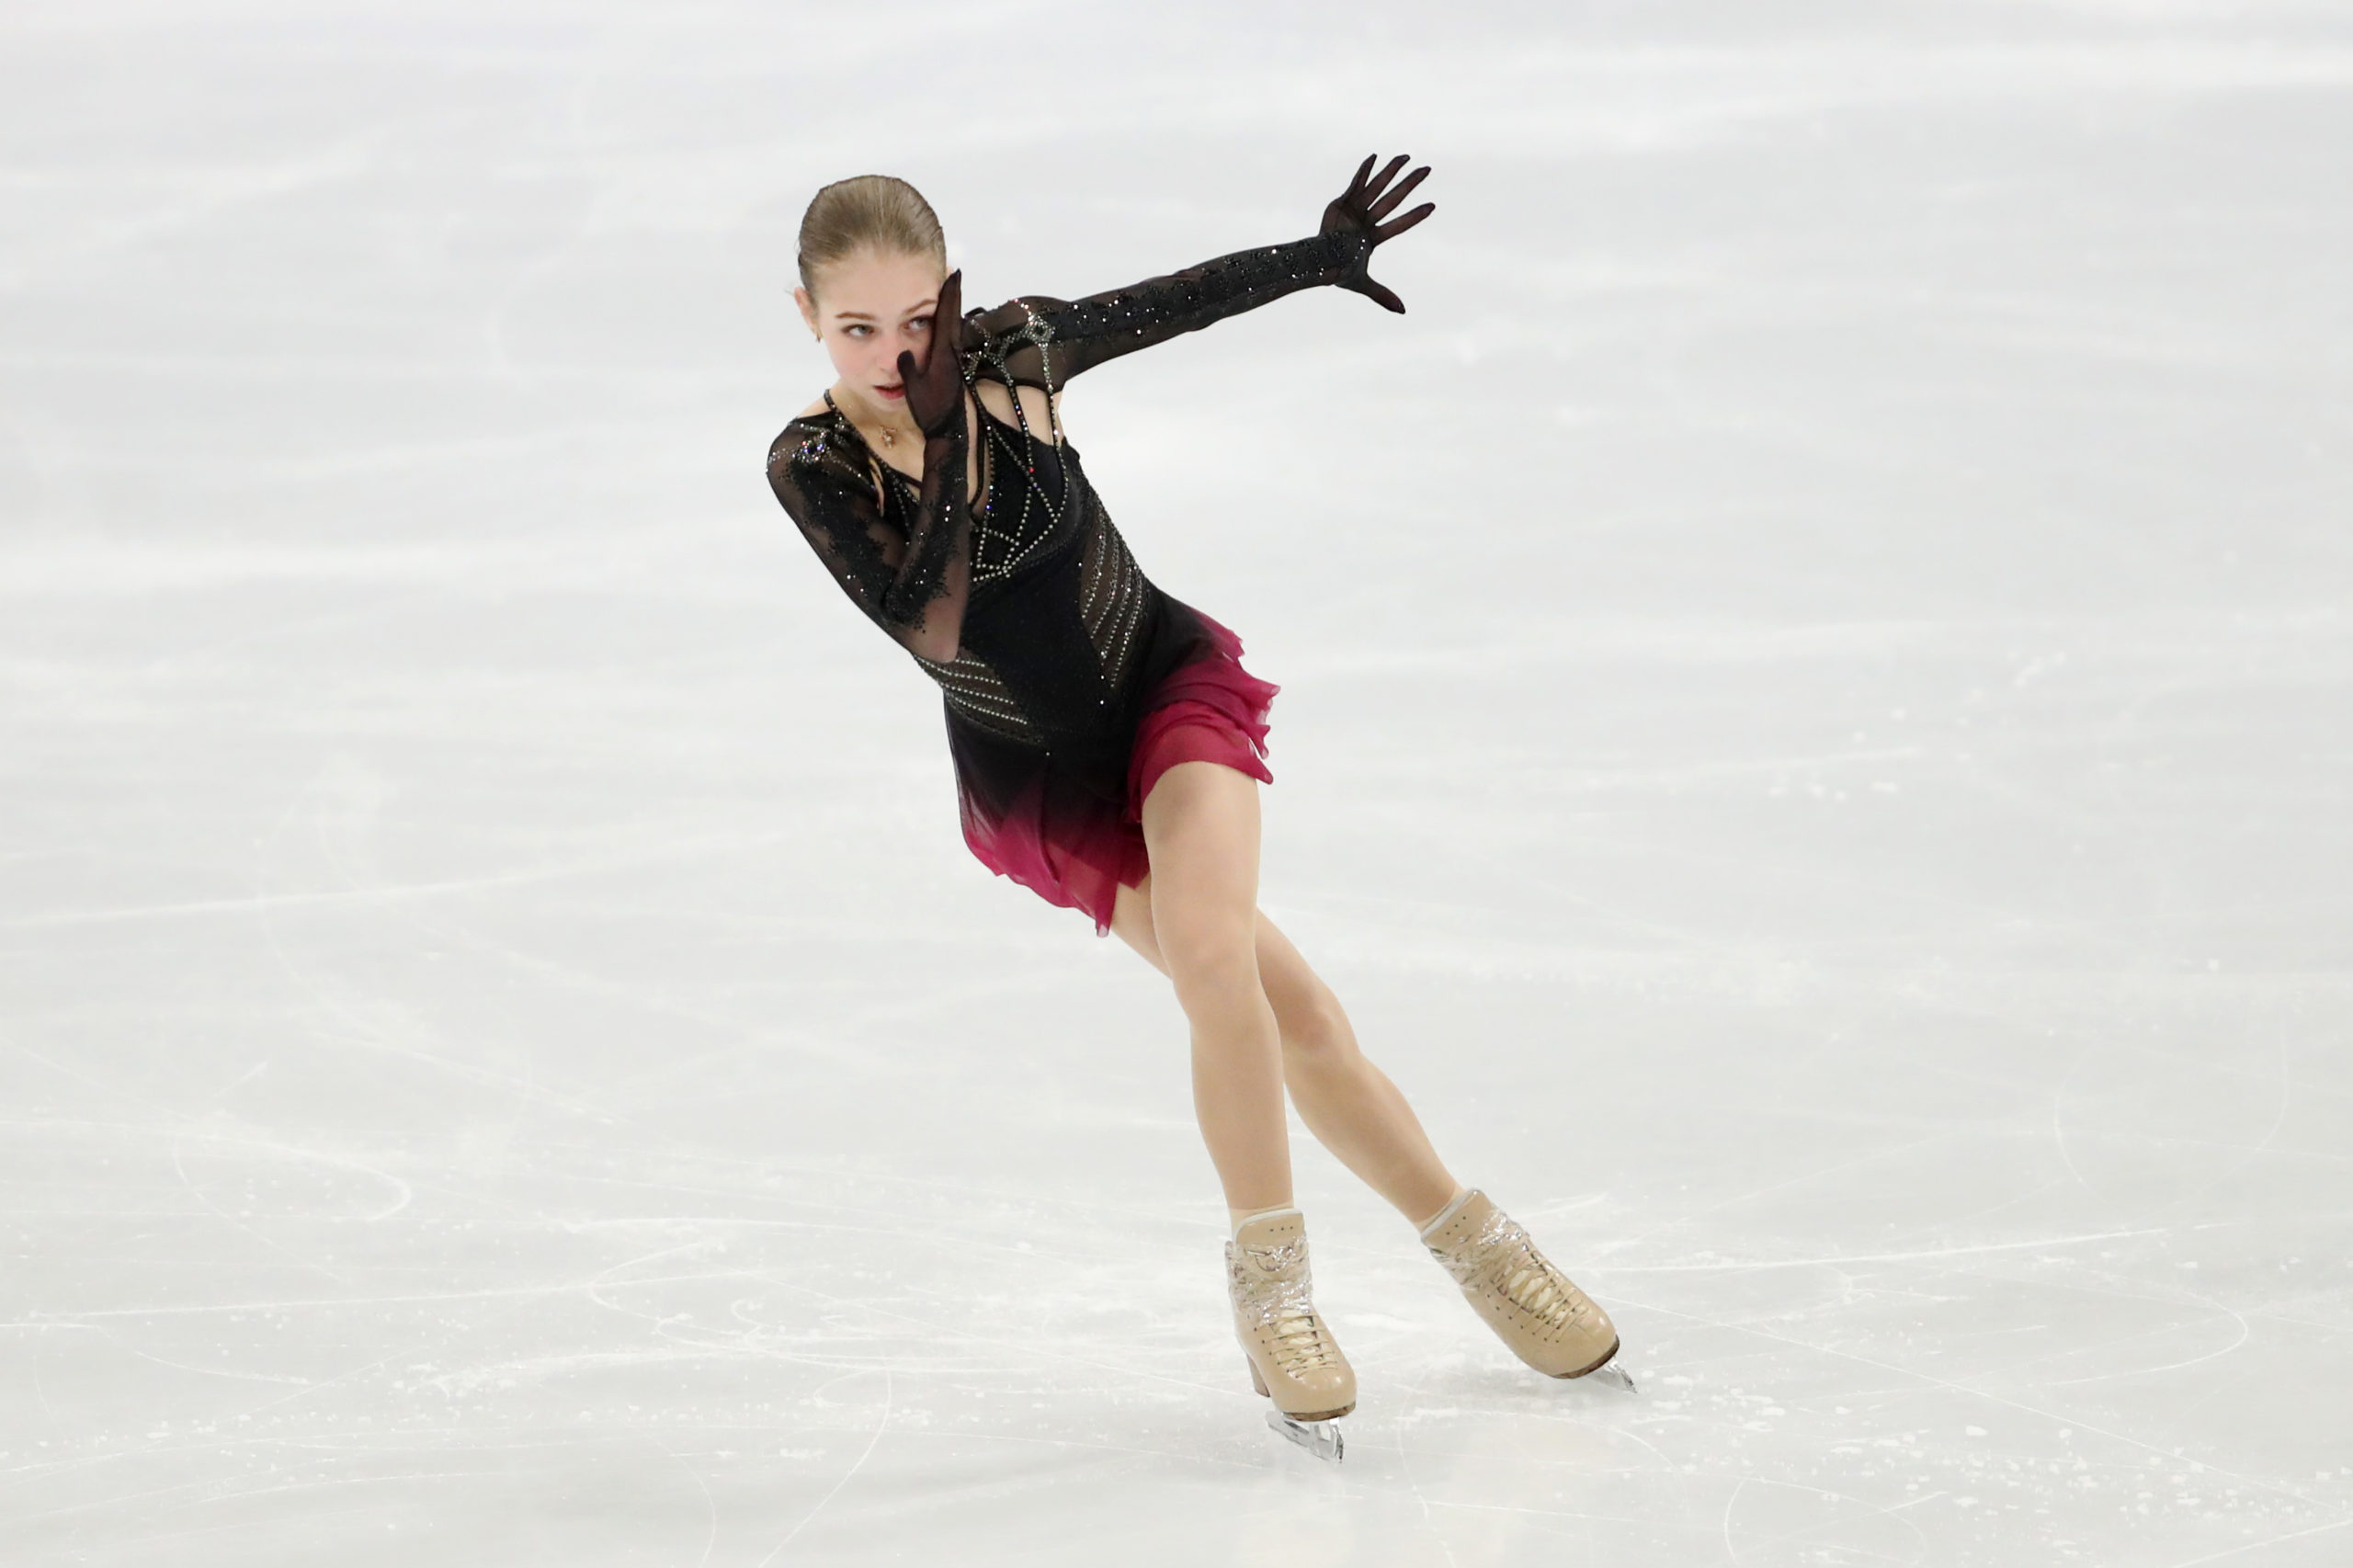 Александра Трусова (Фото: Linnea Rheborg/Getty Images)